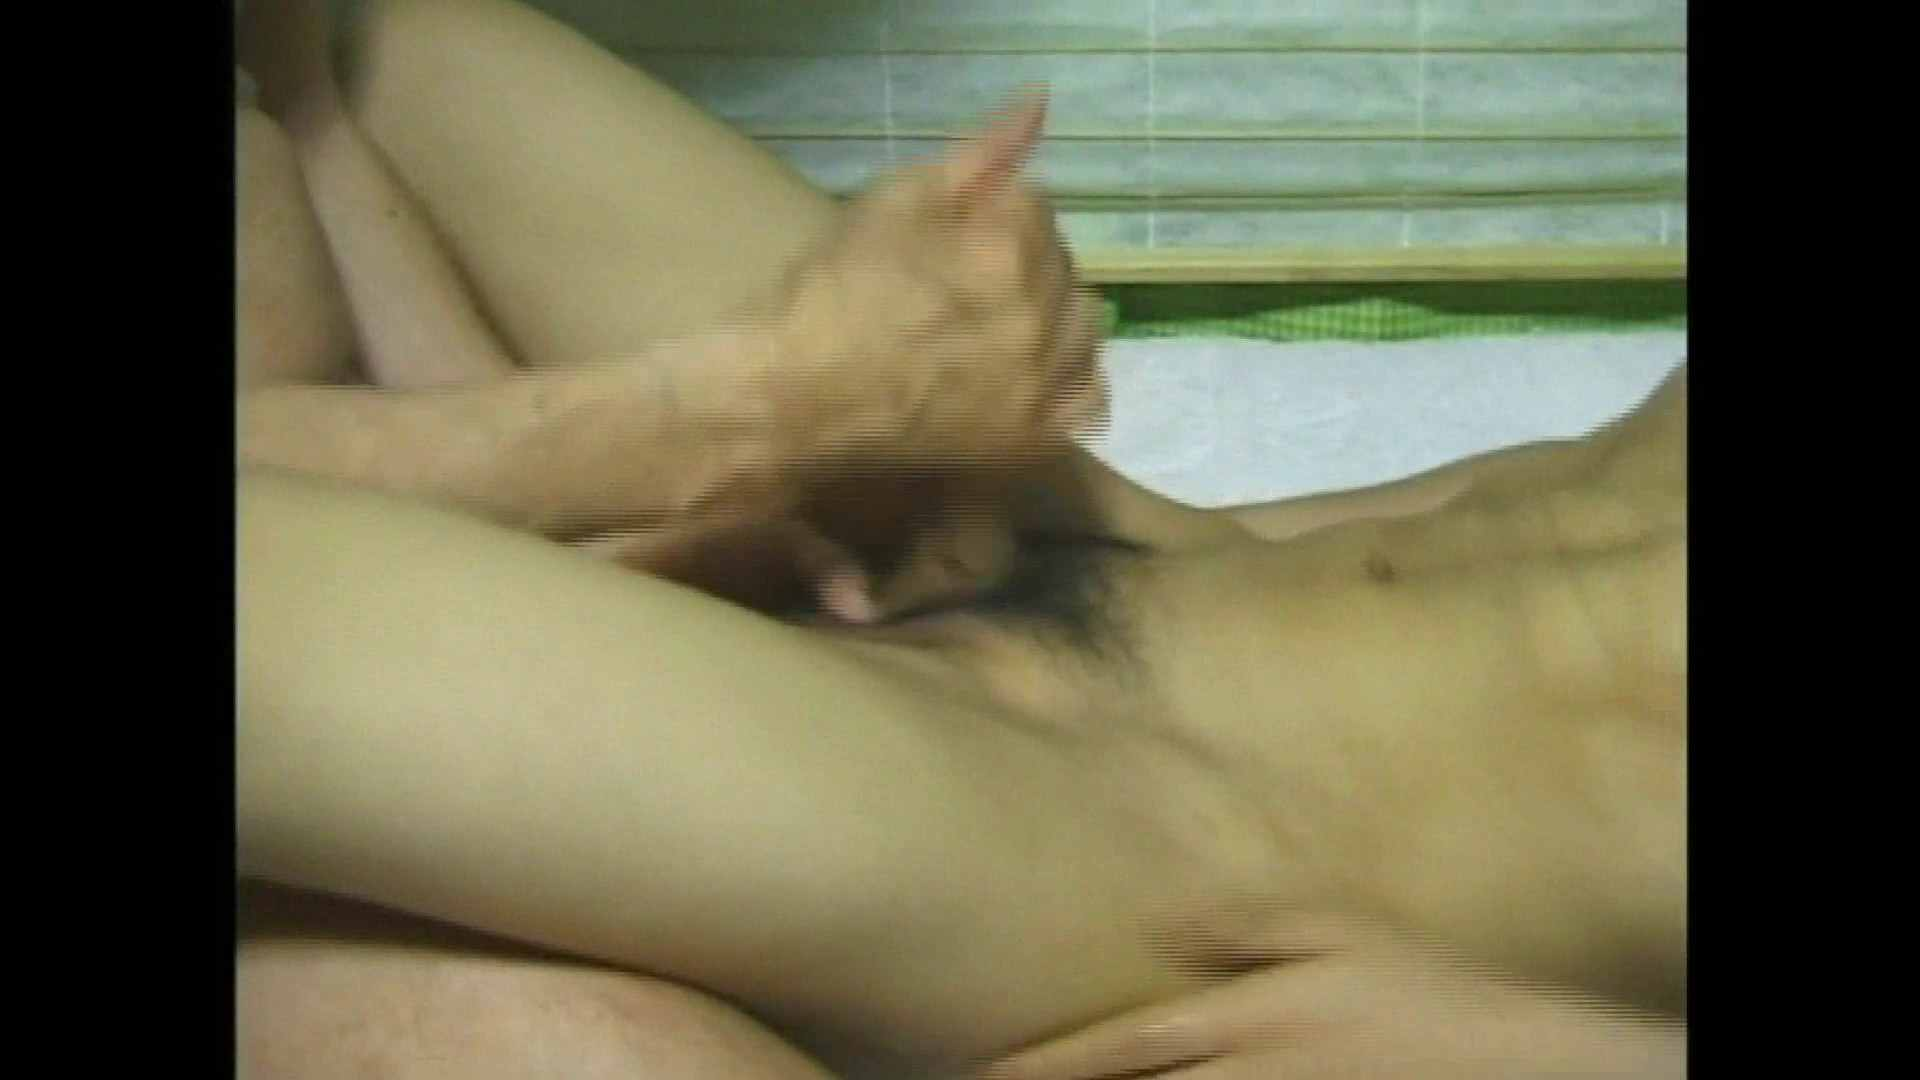 GAYBOY宏のオカズ倉庫Vol.1-3 ゲイのペニス ゲイエロ動画 105枚 26